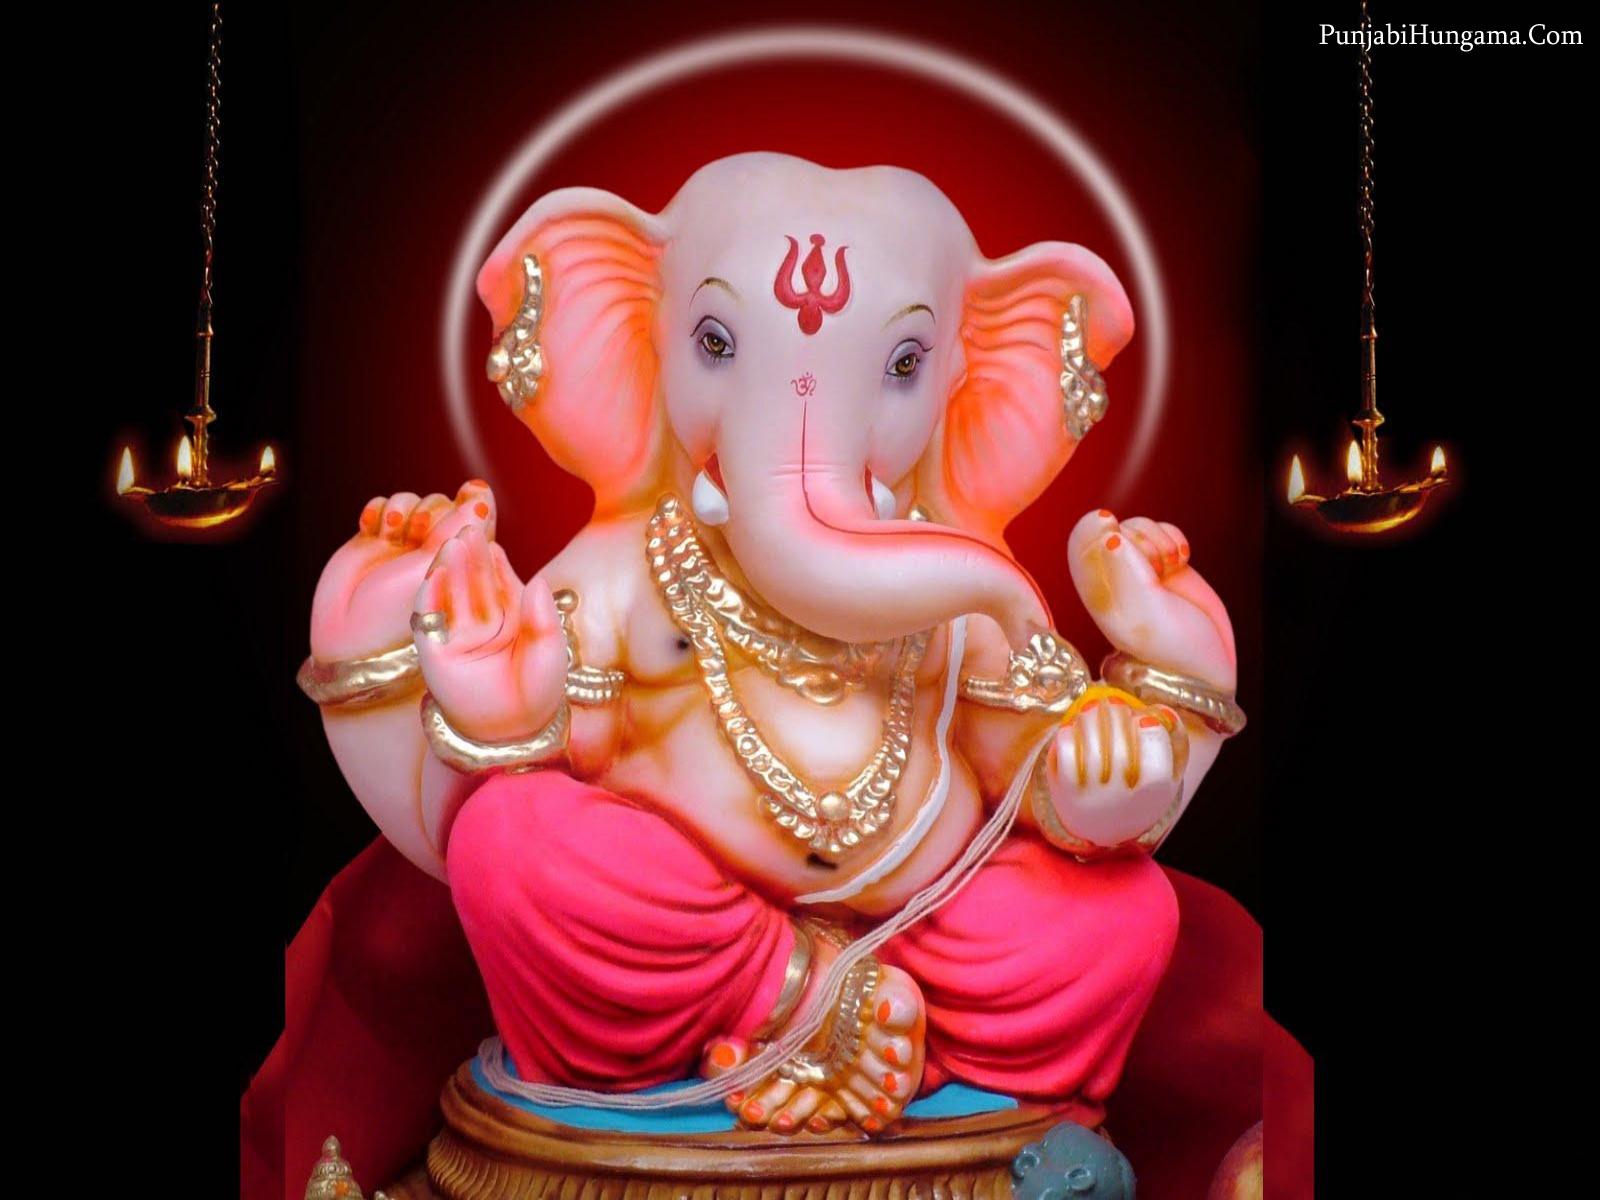 Lord Ganesha HD Wallpapers - Page 1 - bhmpics.com